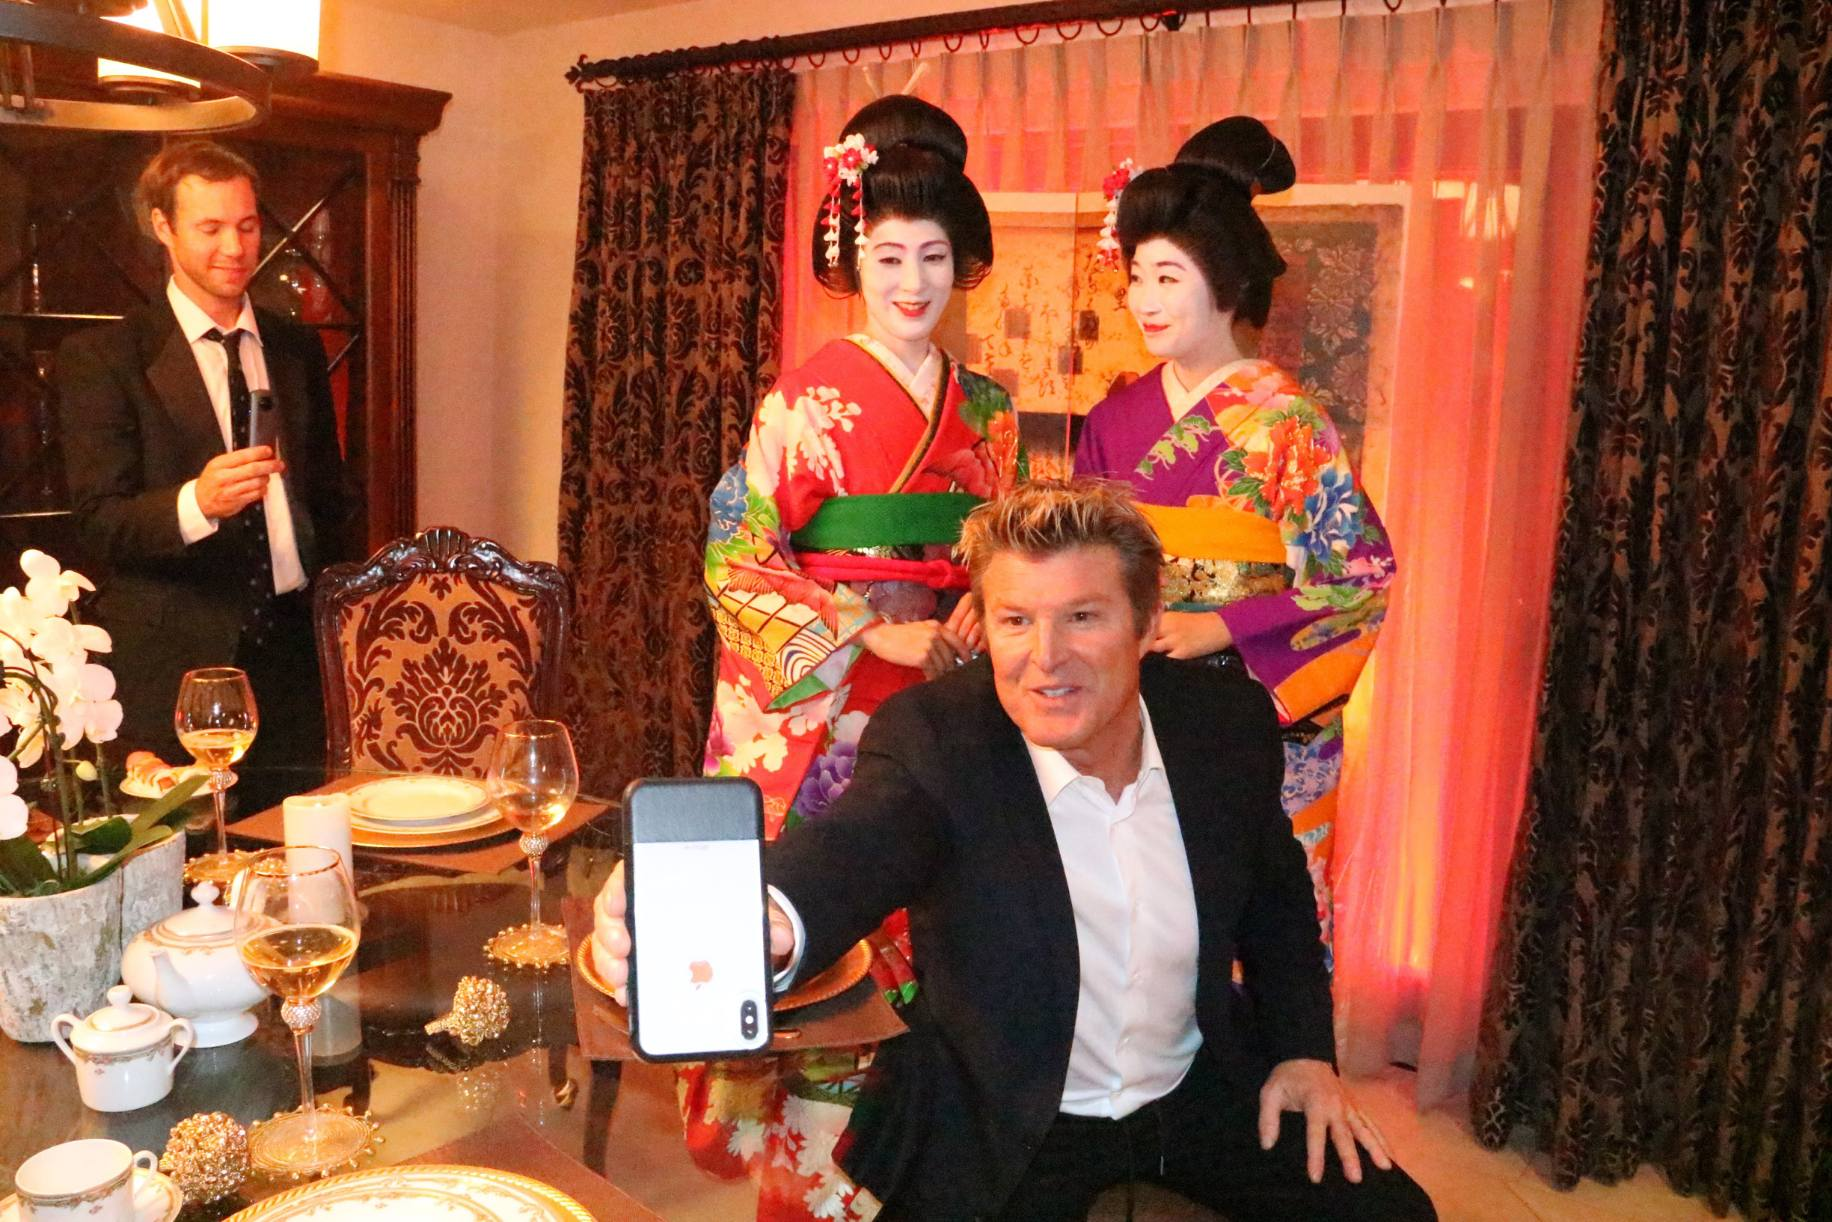 Winsor Harmon, Nico Santucci, Ruby Park, and Ikumi Yoshimatsu in Sarogeto (2021)